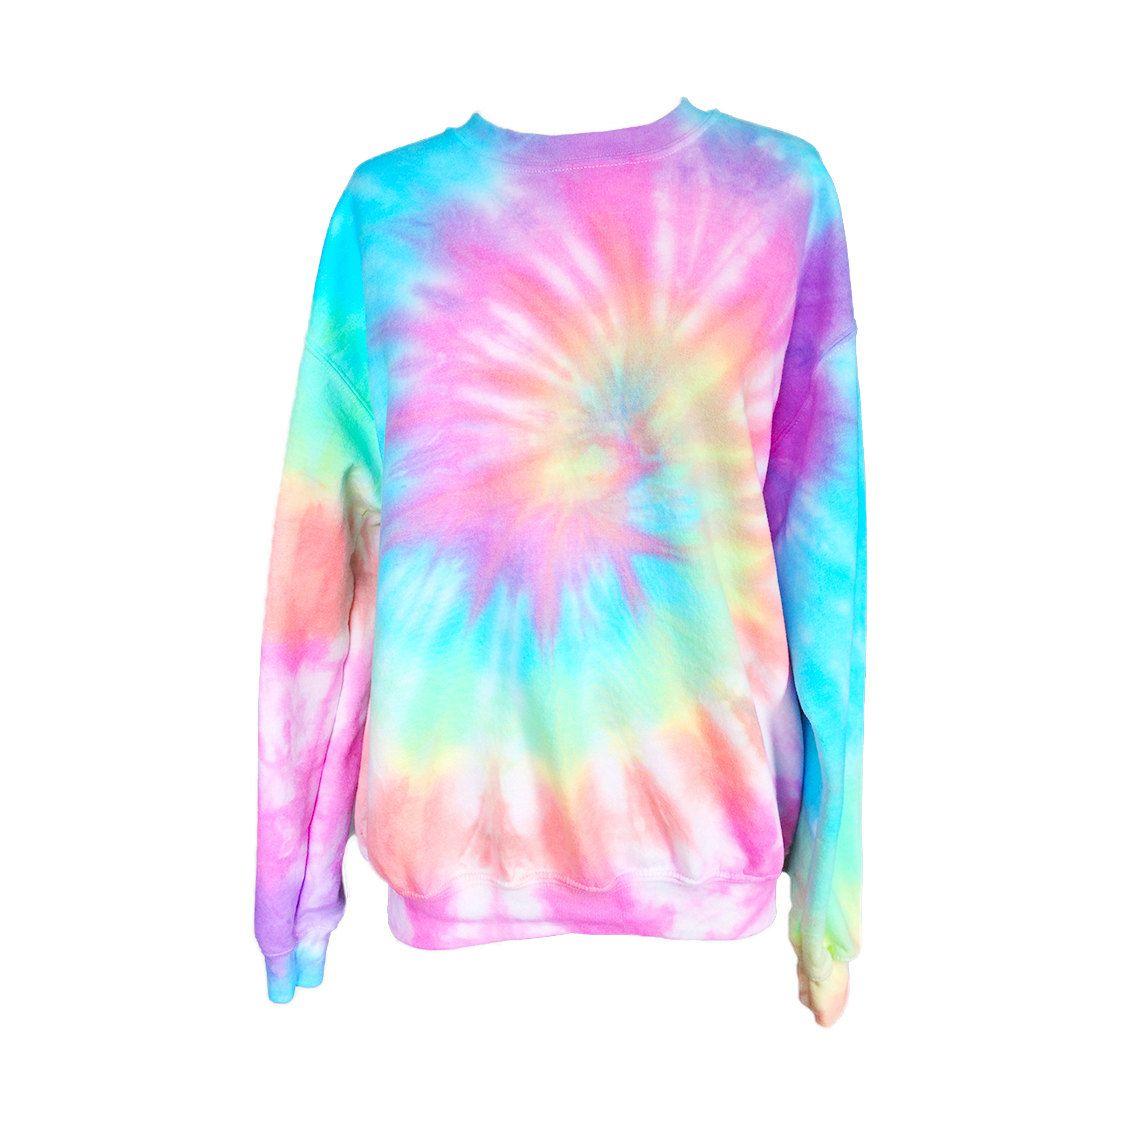 Tie Dye Sweatshirt Pastel Tie Dye Sweatshirt Custom Grunge Sweatshirt Tie Dye Sweatshirt Tie Dye Shirts Pastel Tie Dye [ 1125 x 1125 Pixel ]